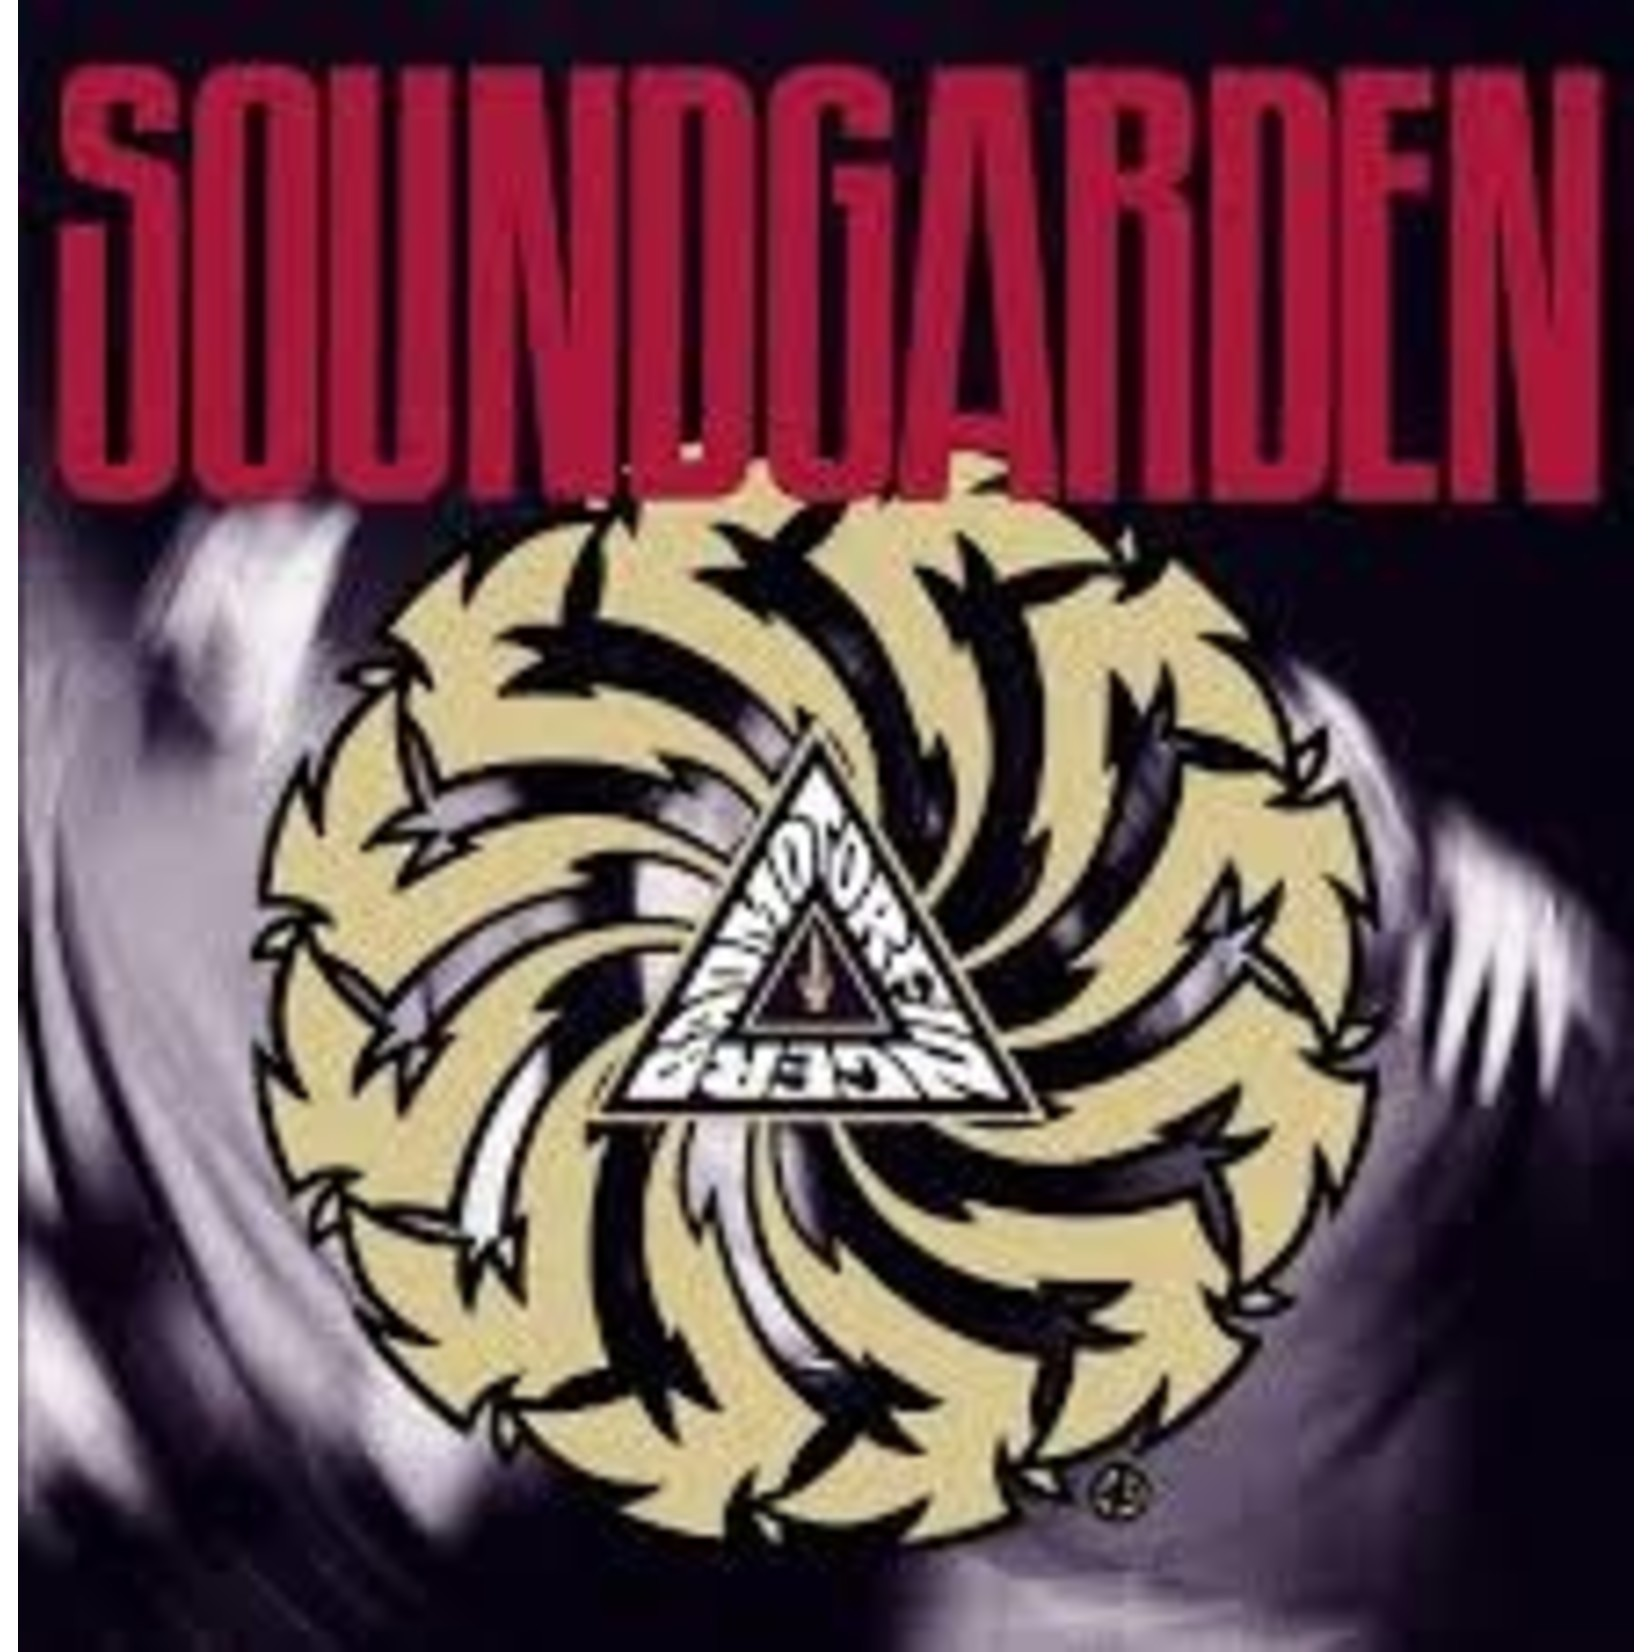 Vinyl Soundgarden - Badmotofinger